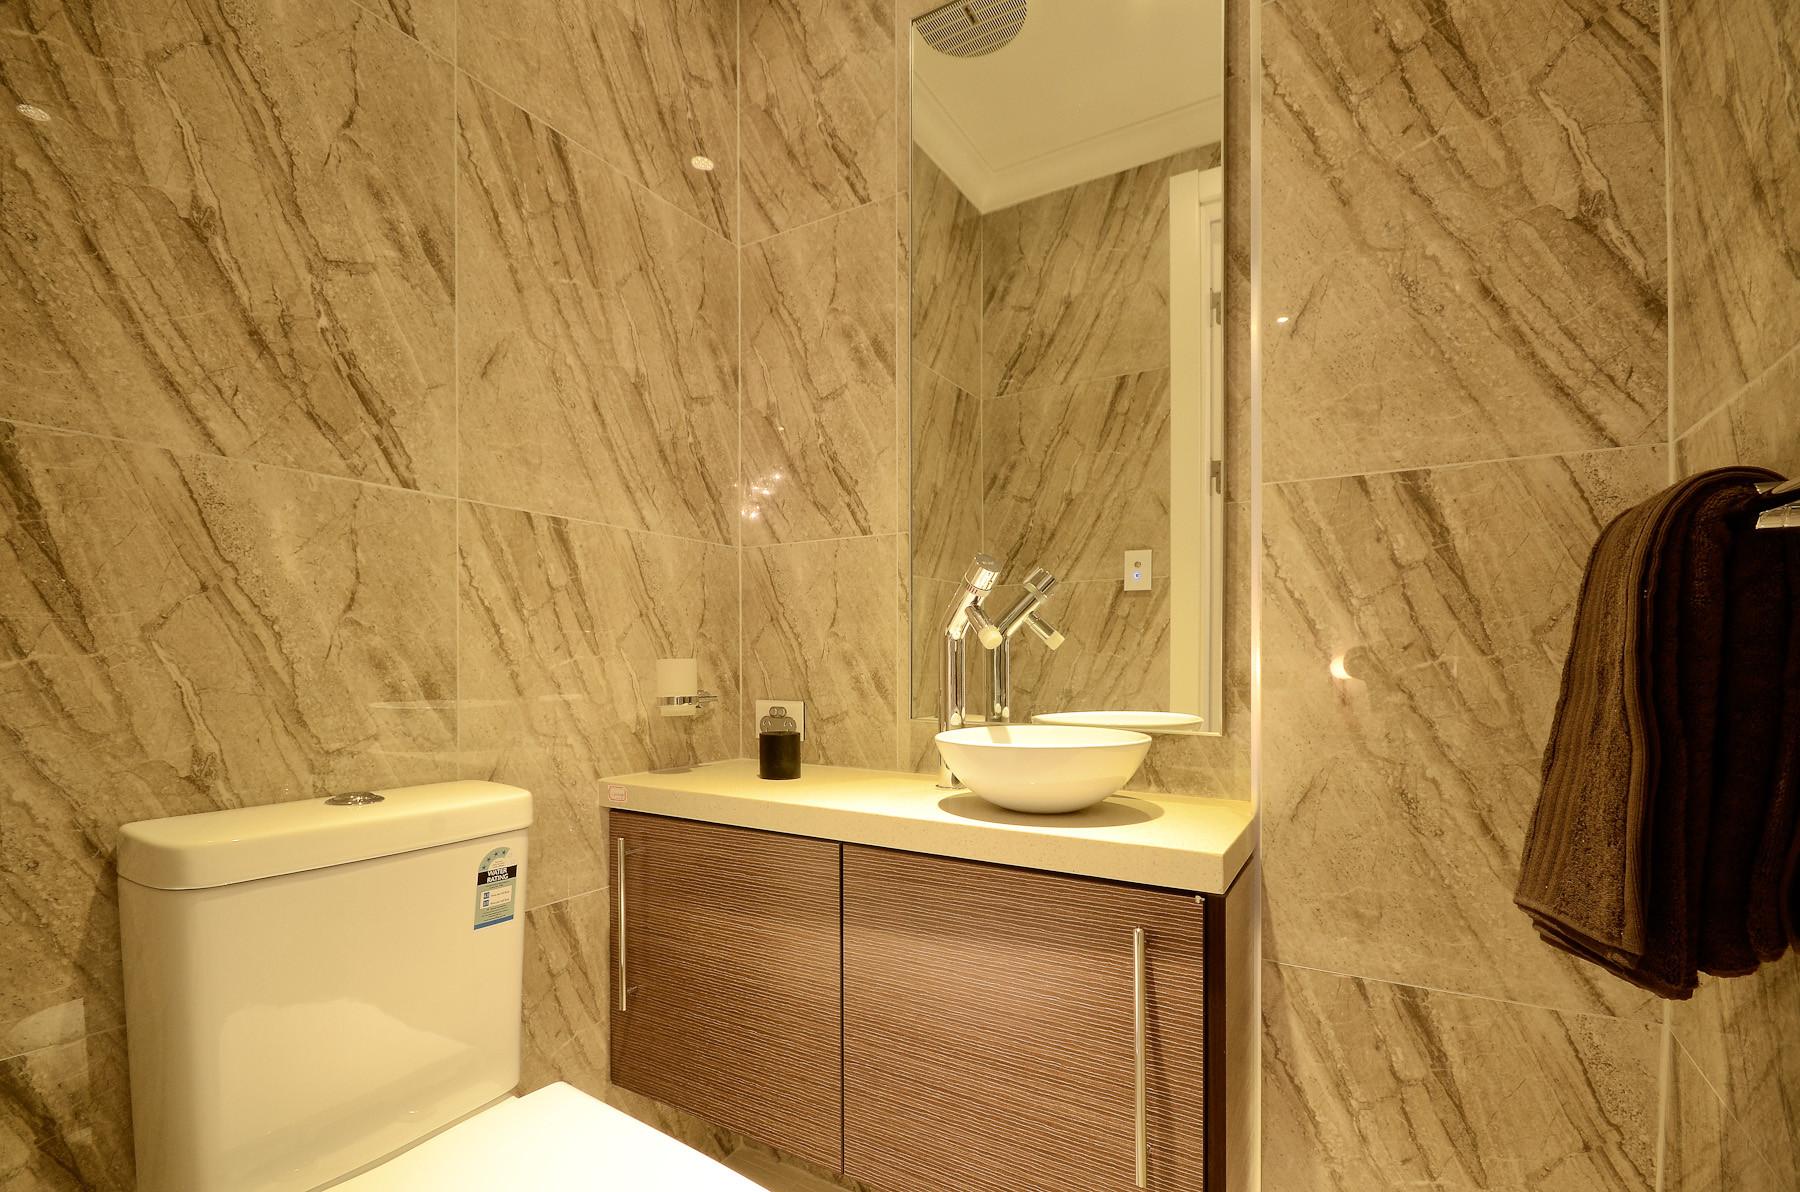 Contemporary Bathroom Vanity St James, Perth